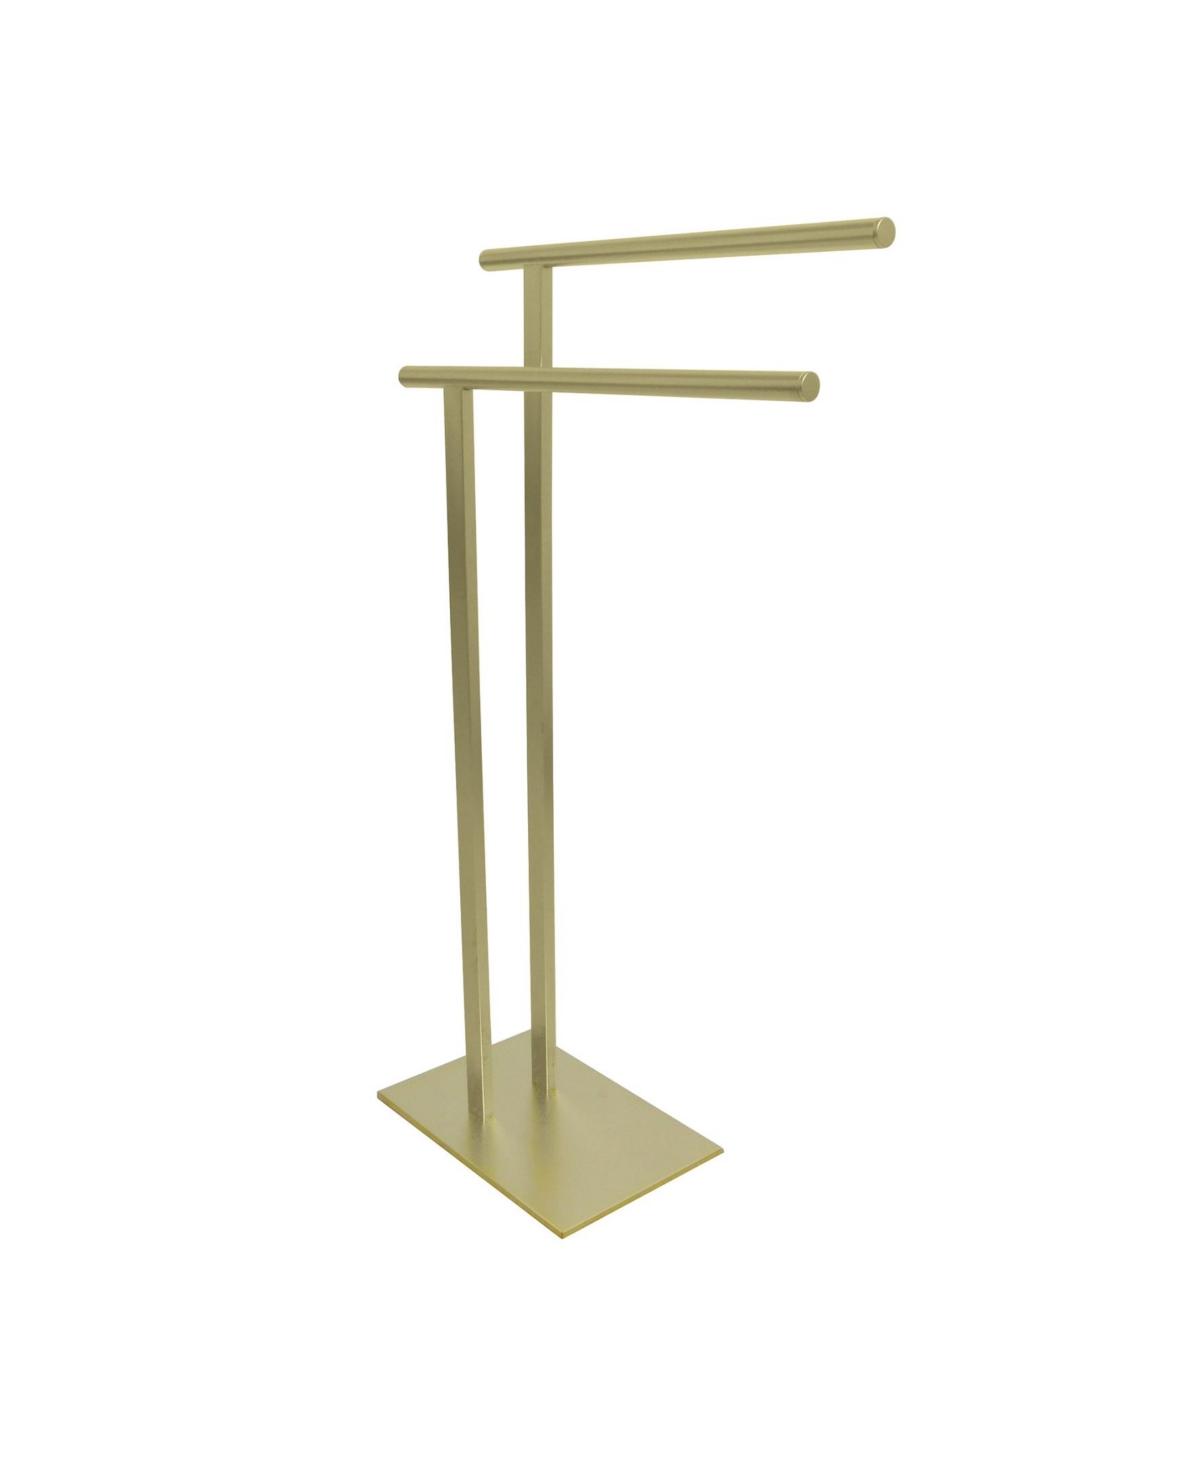 Kingston Brass Double L Shape Pedestal Towel Holder in Satin Brass Bedding